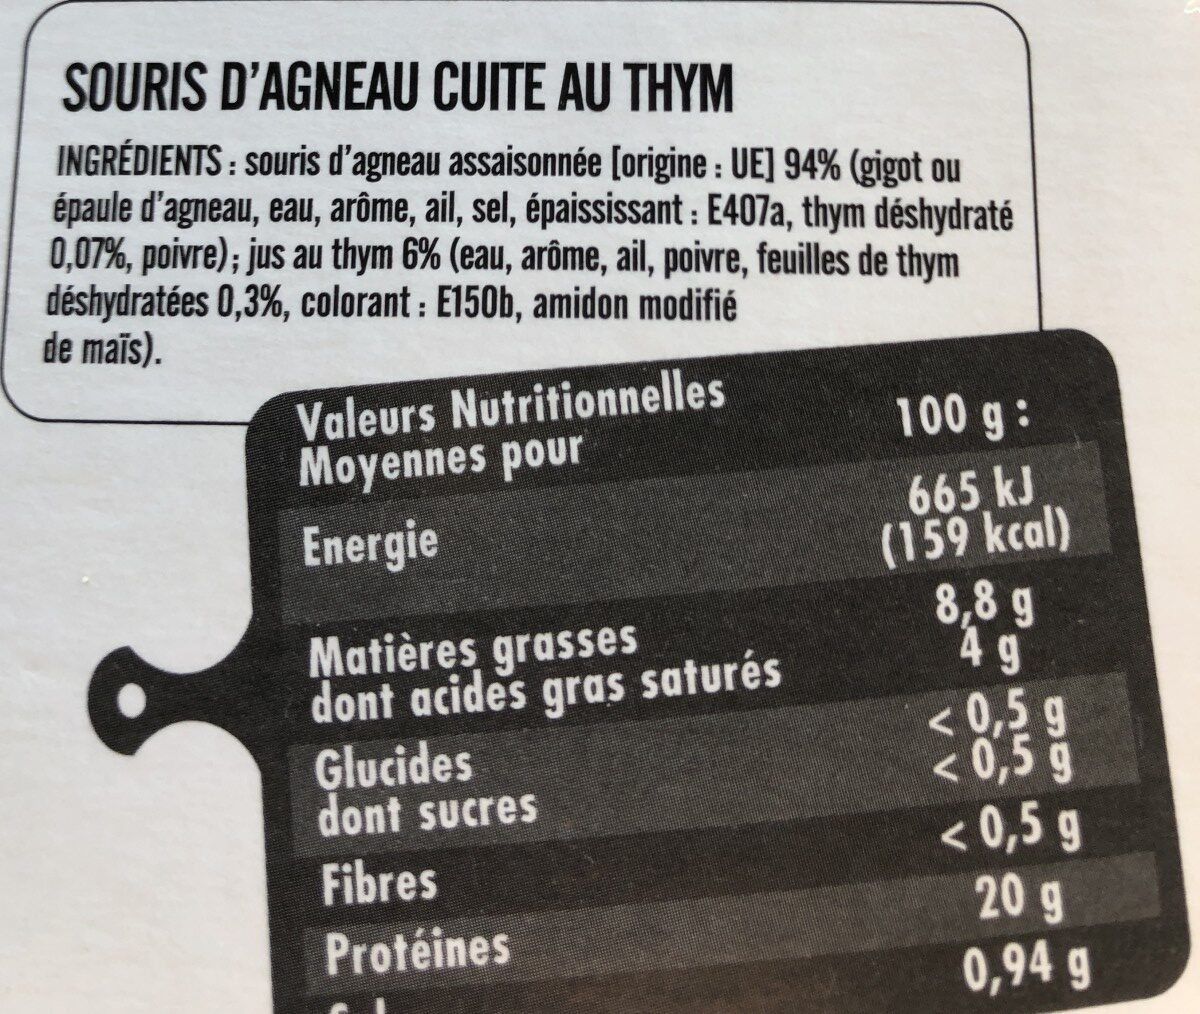 Souris d'agneau - Ingrediënten